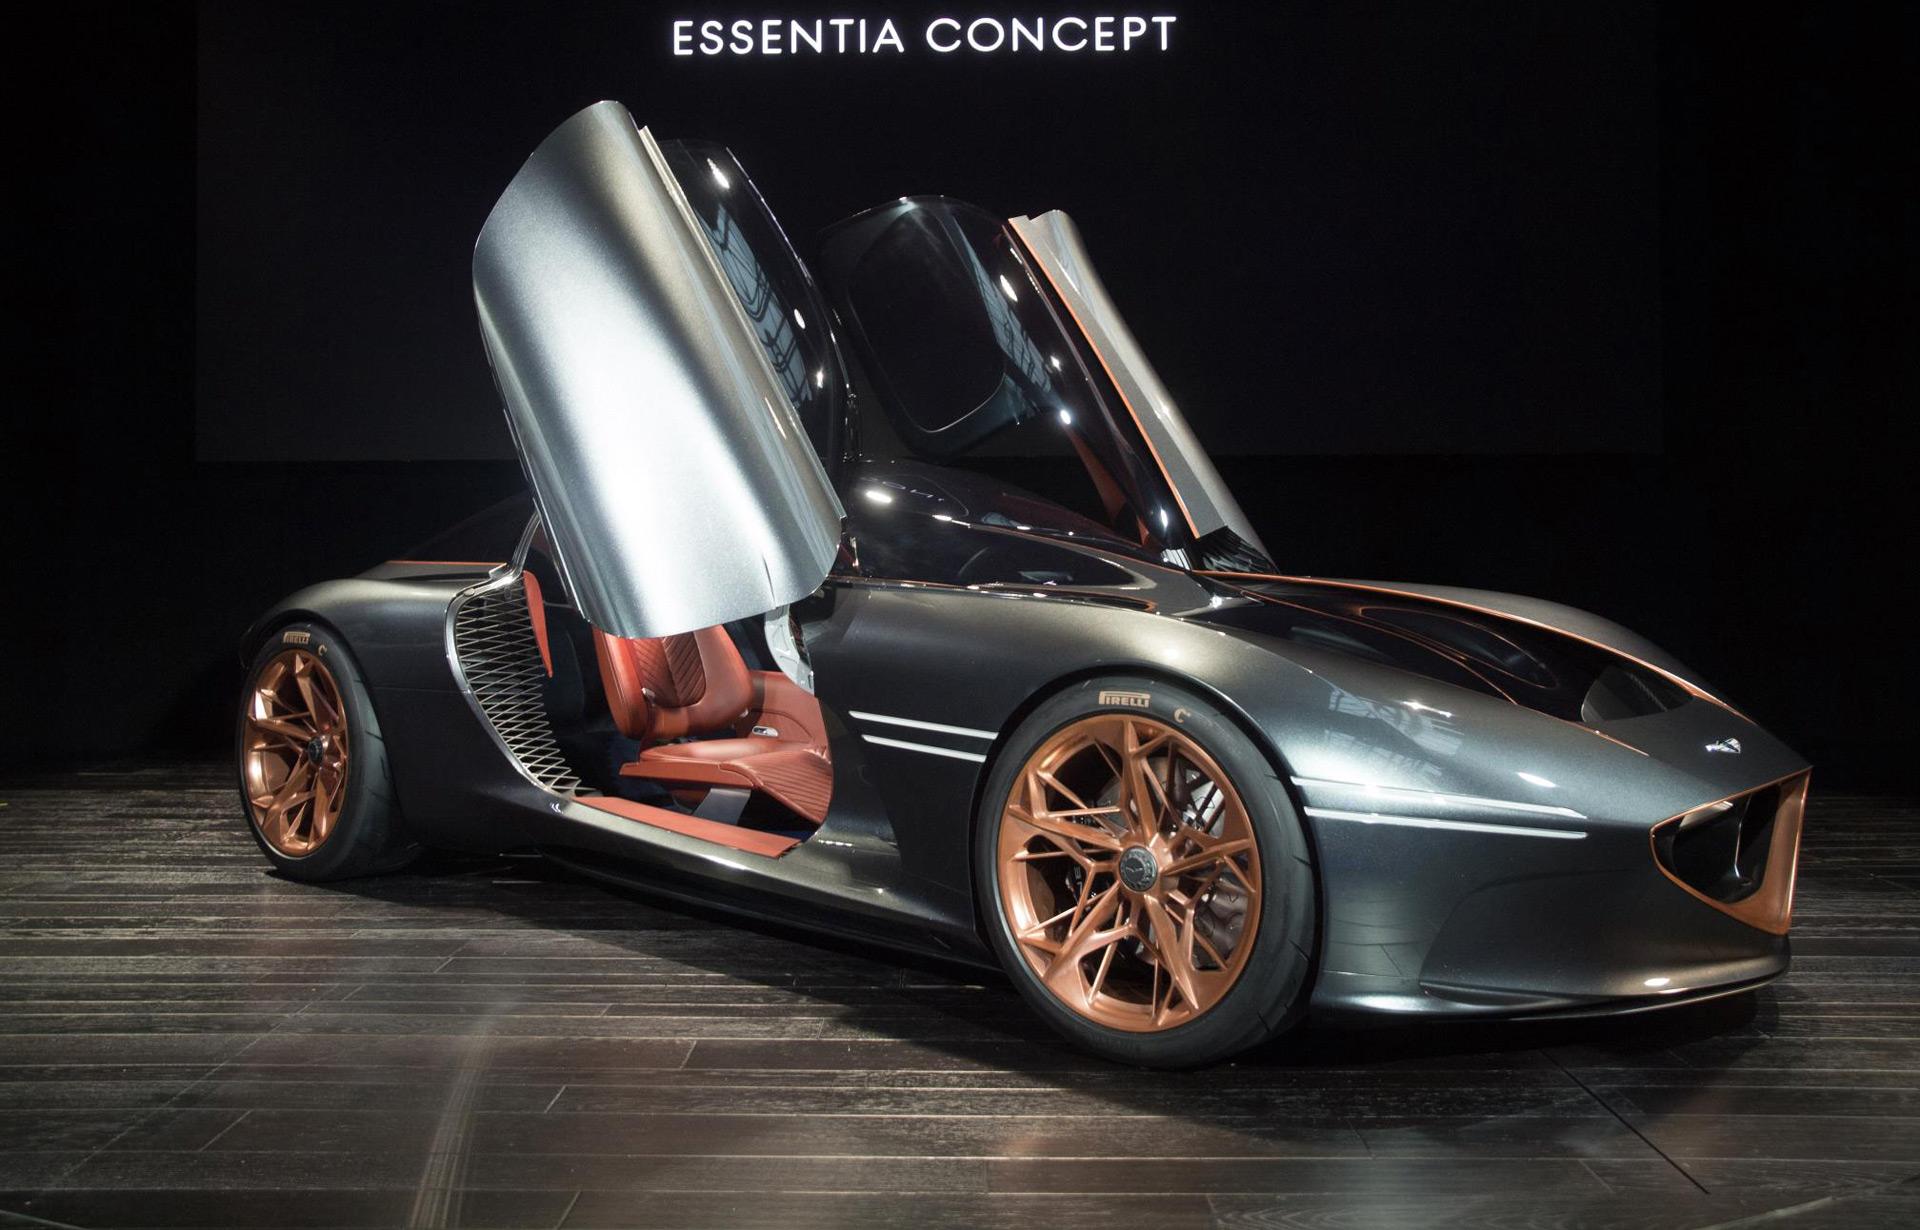 Genesis Essentia Concept: Here's your luxury Rorschach test